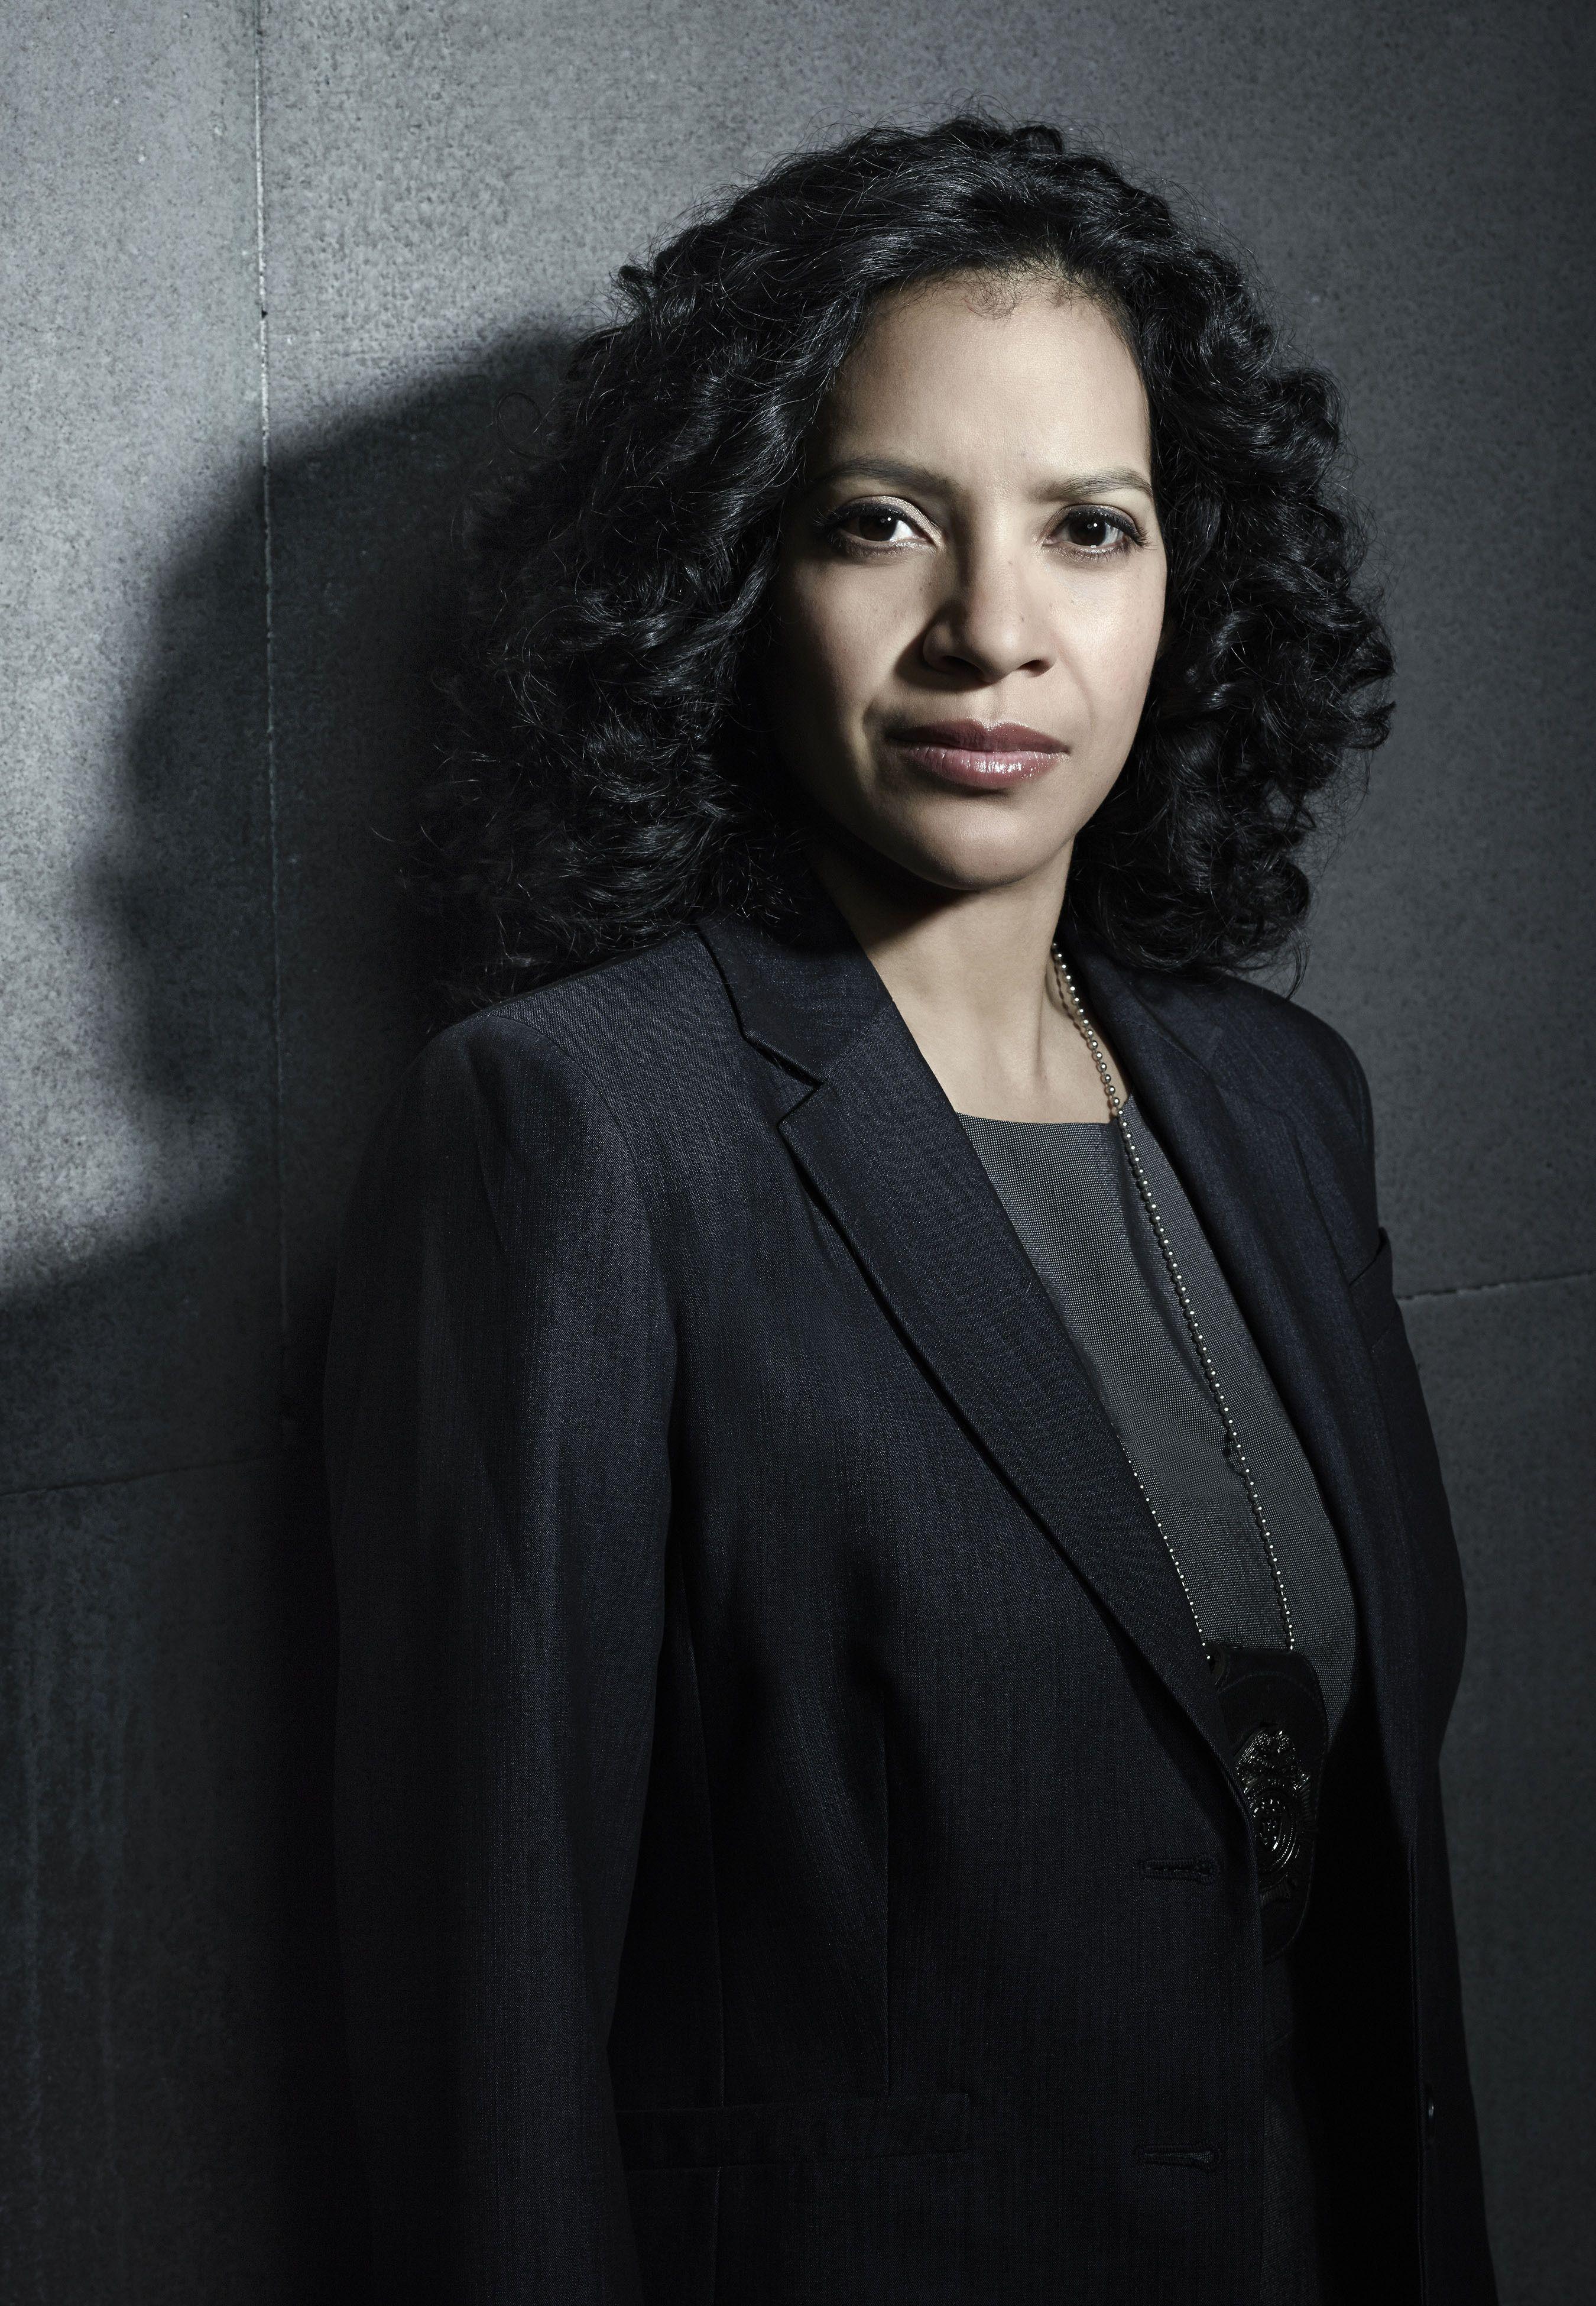 Sarah Essen